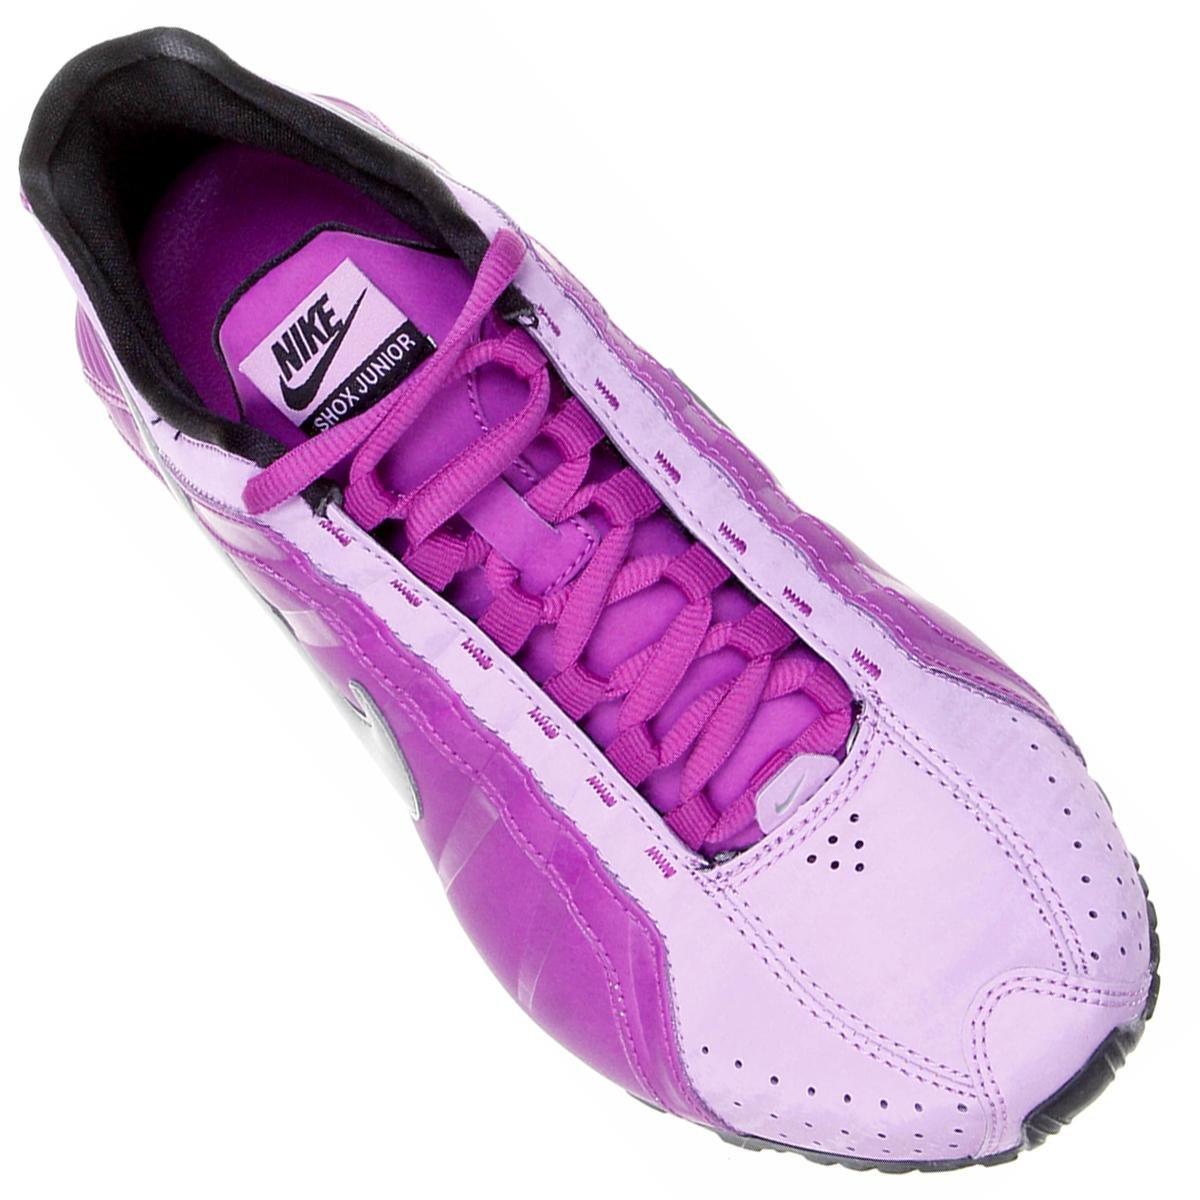 3eec208a150112 ... best price tênis nike shox junior roxo e lilás 3bd2d 2c3d7